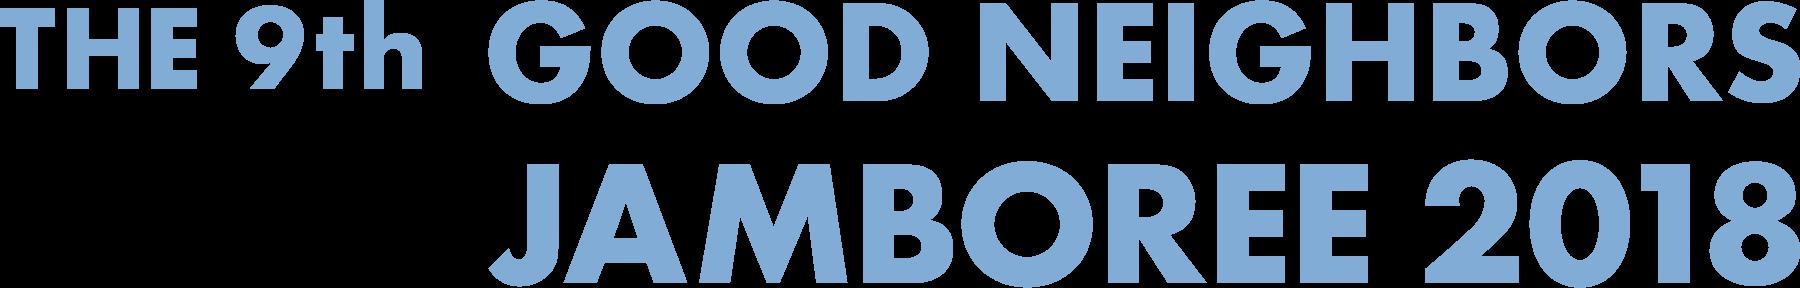 GOOD NEIGHBORS JAMBOREE 2018 | 2018年8月18日かわなべ森の学校